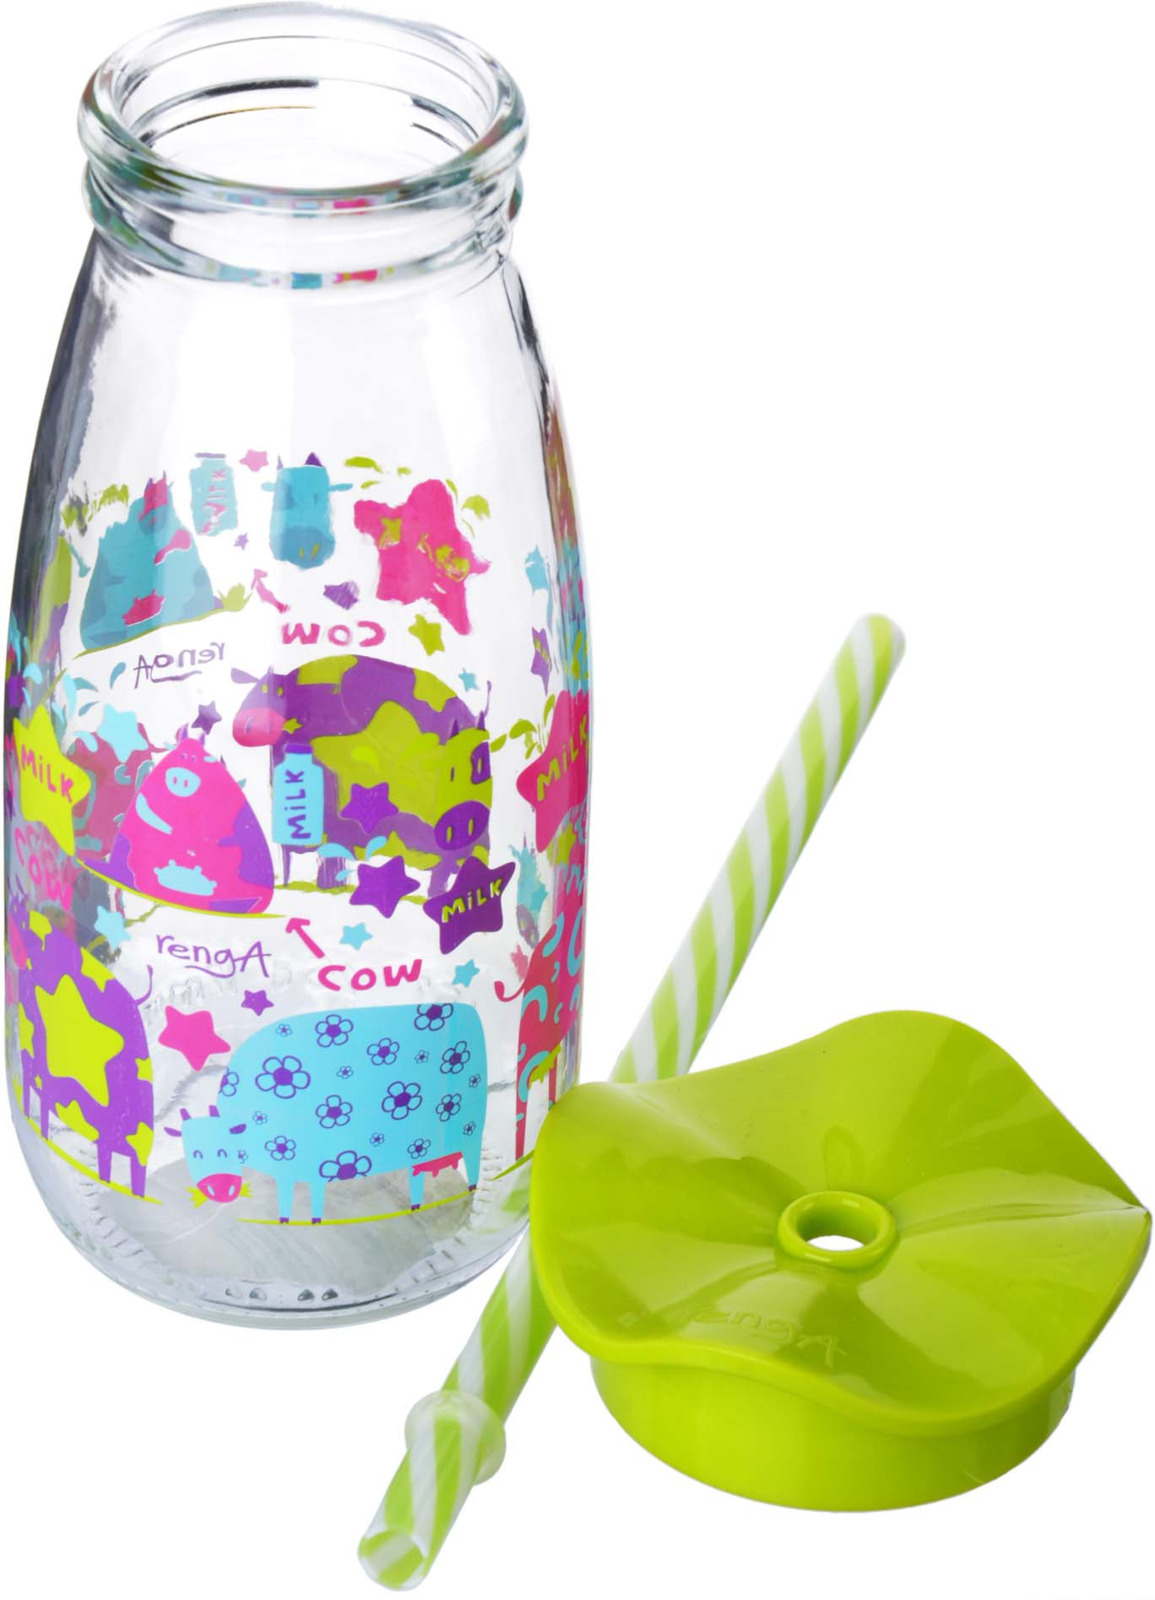 Бутылка для смузи Mayer & Boch, цвет: салатовый, 500 мл